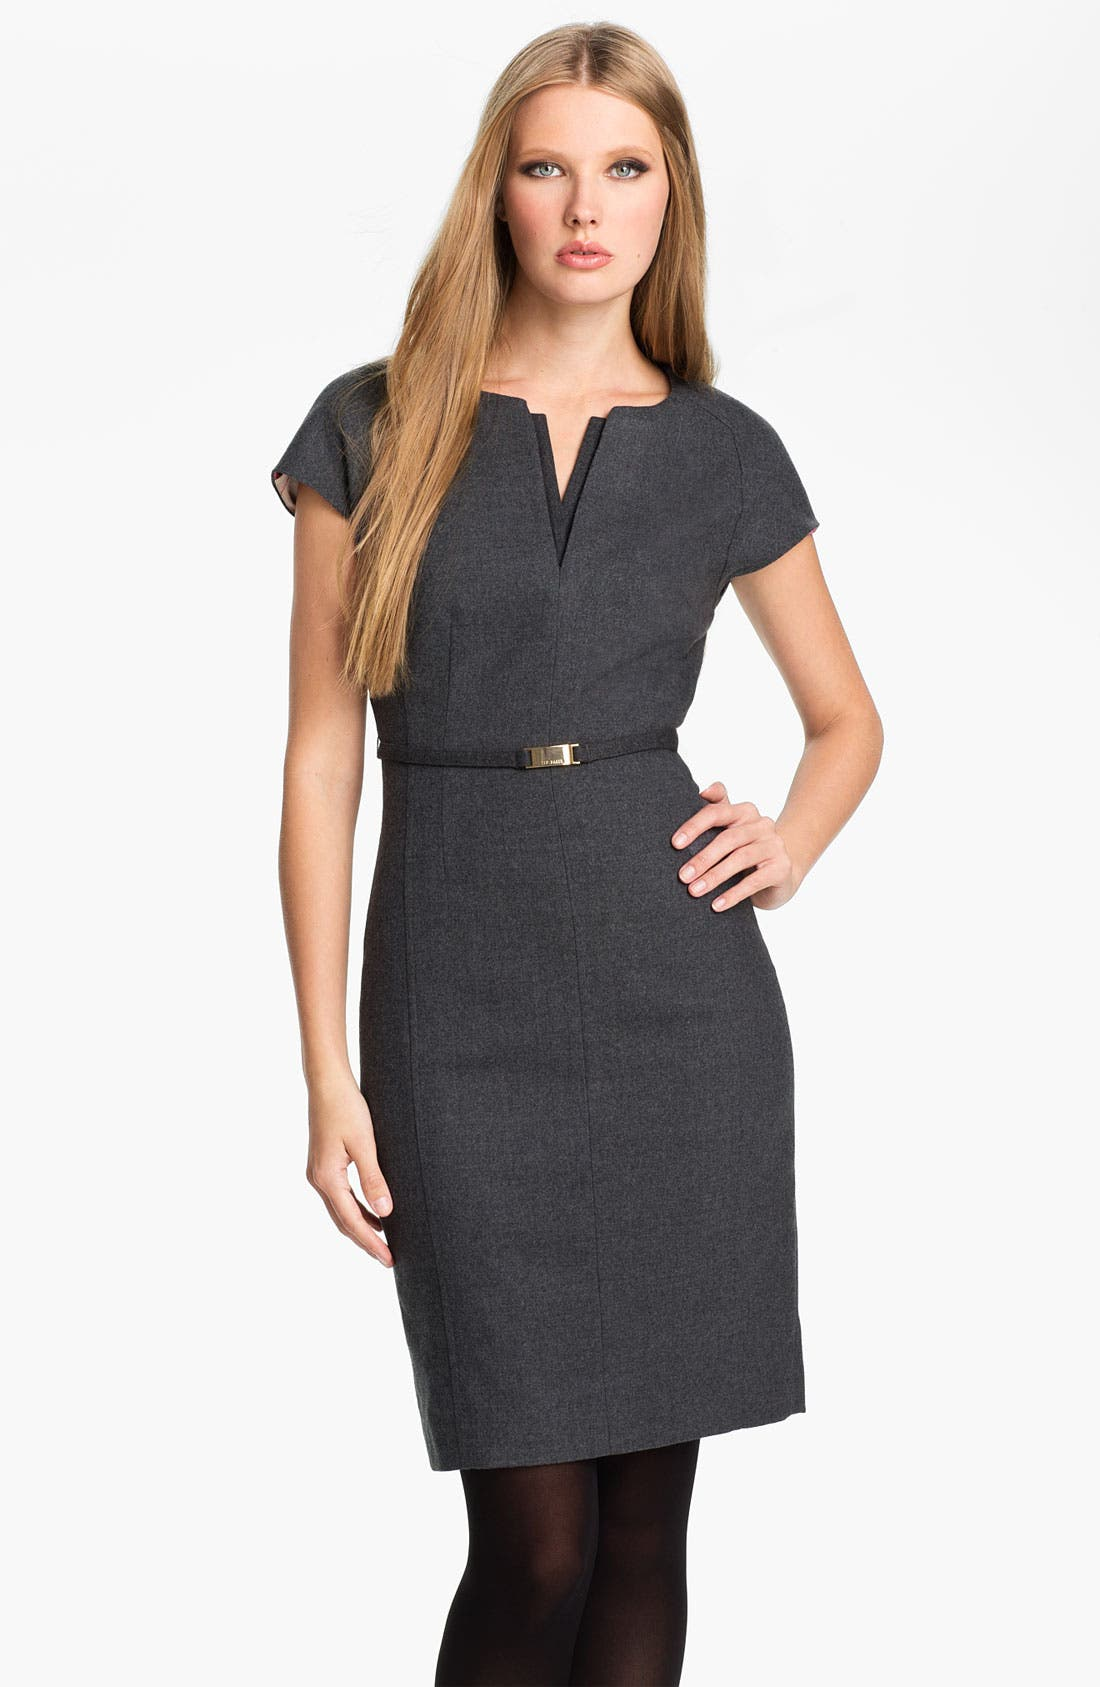 Main Image - Ted Baker London 'Neyoad' Wool Sheath Dress